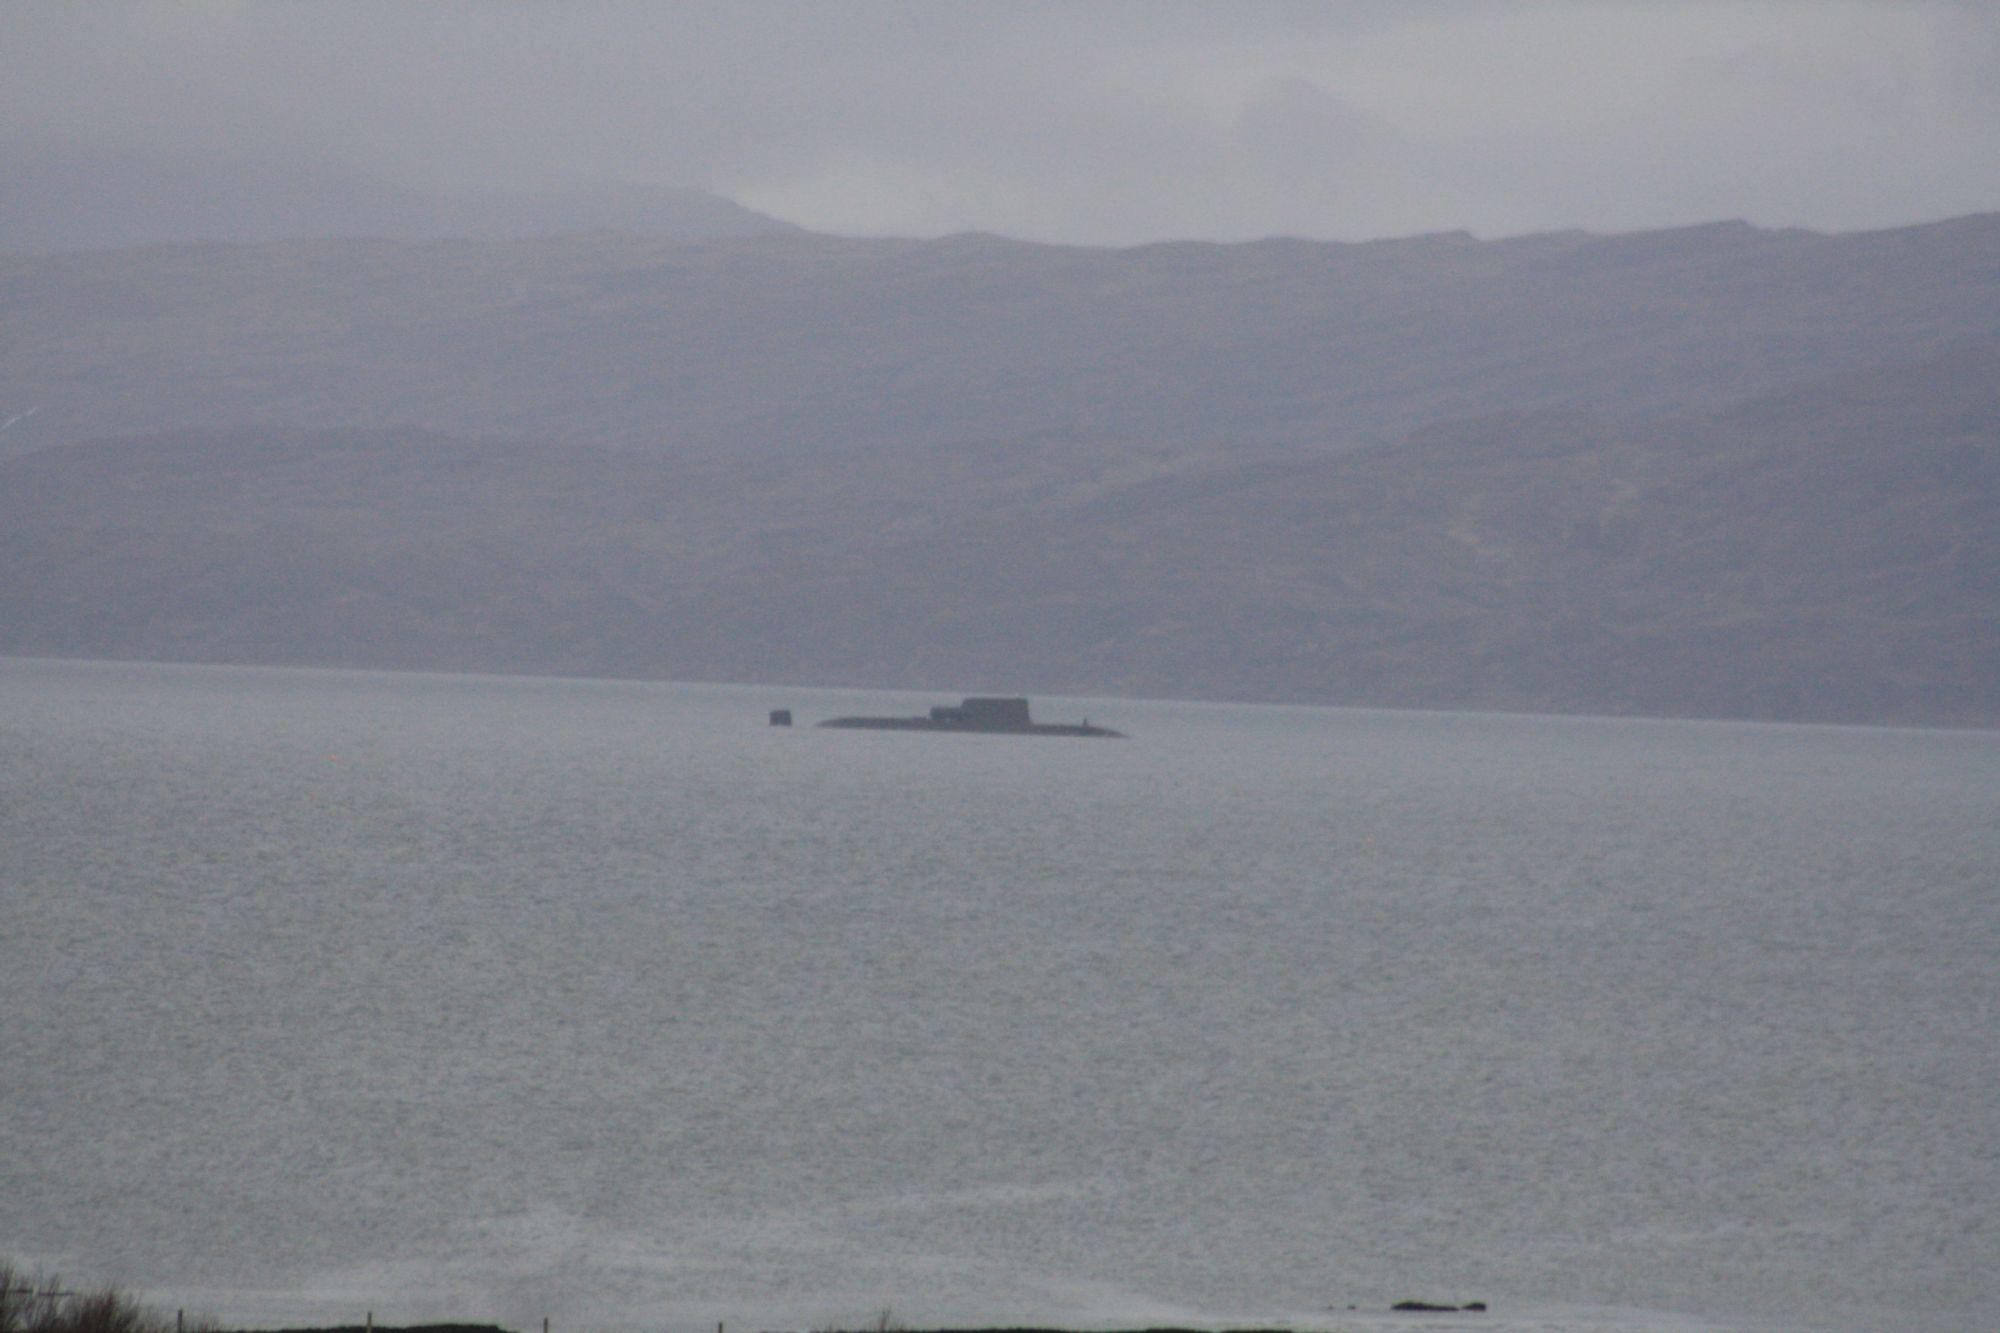 Sub off Skye